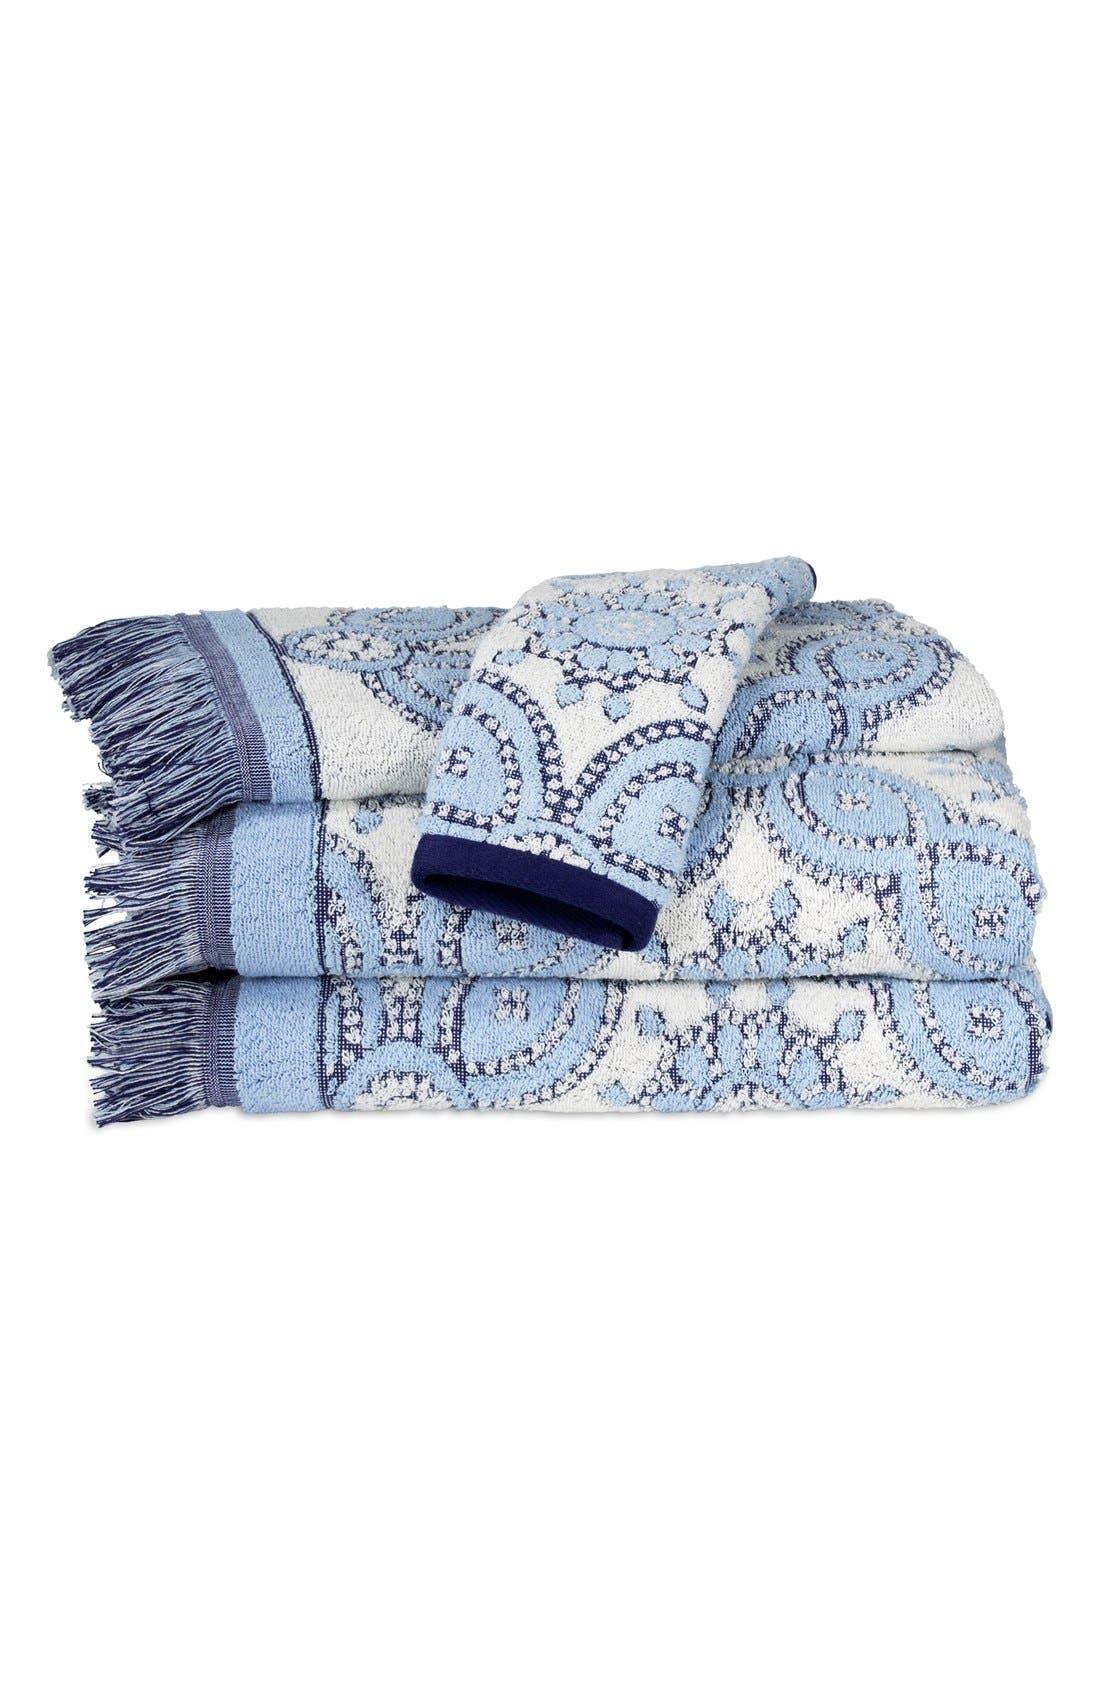 Alternate Image 1 Selected - John Robshaw 'Petra' Cotton Bath Towel